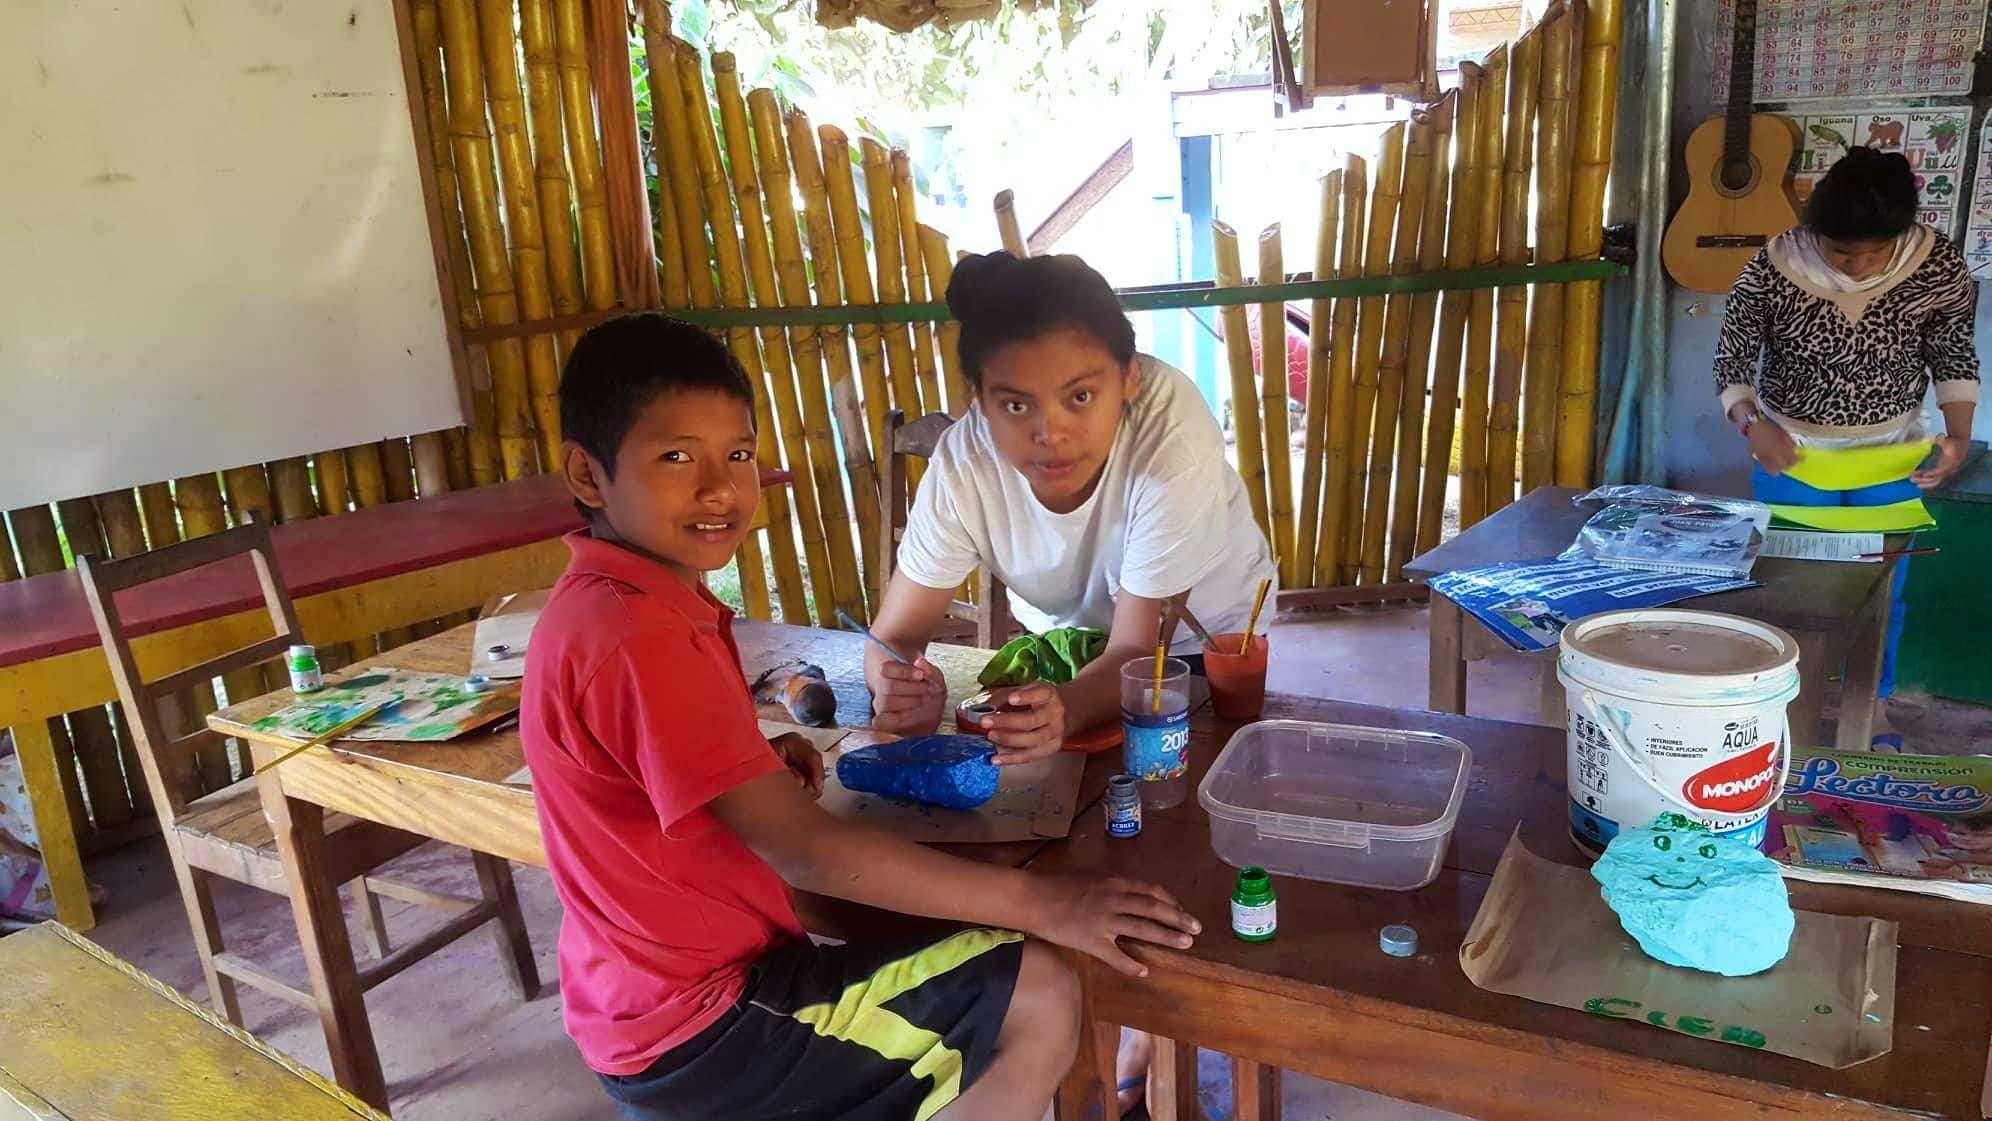 Promote environmental education to children